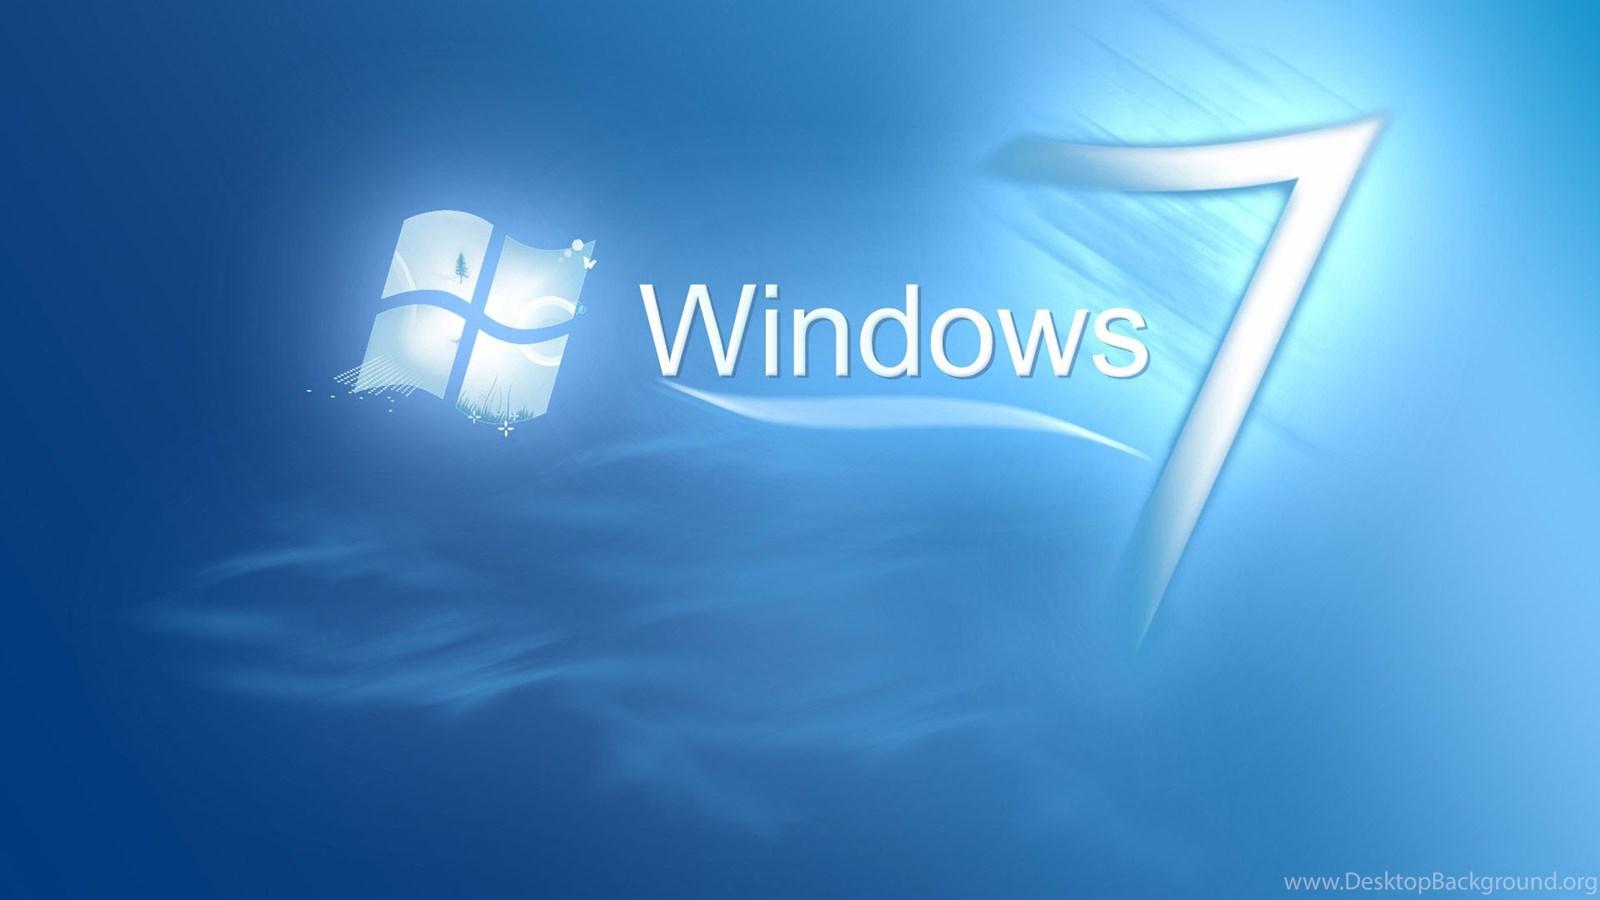 Windows 7 Professional Digital Set Us Desktop Wallpapers Desktop